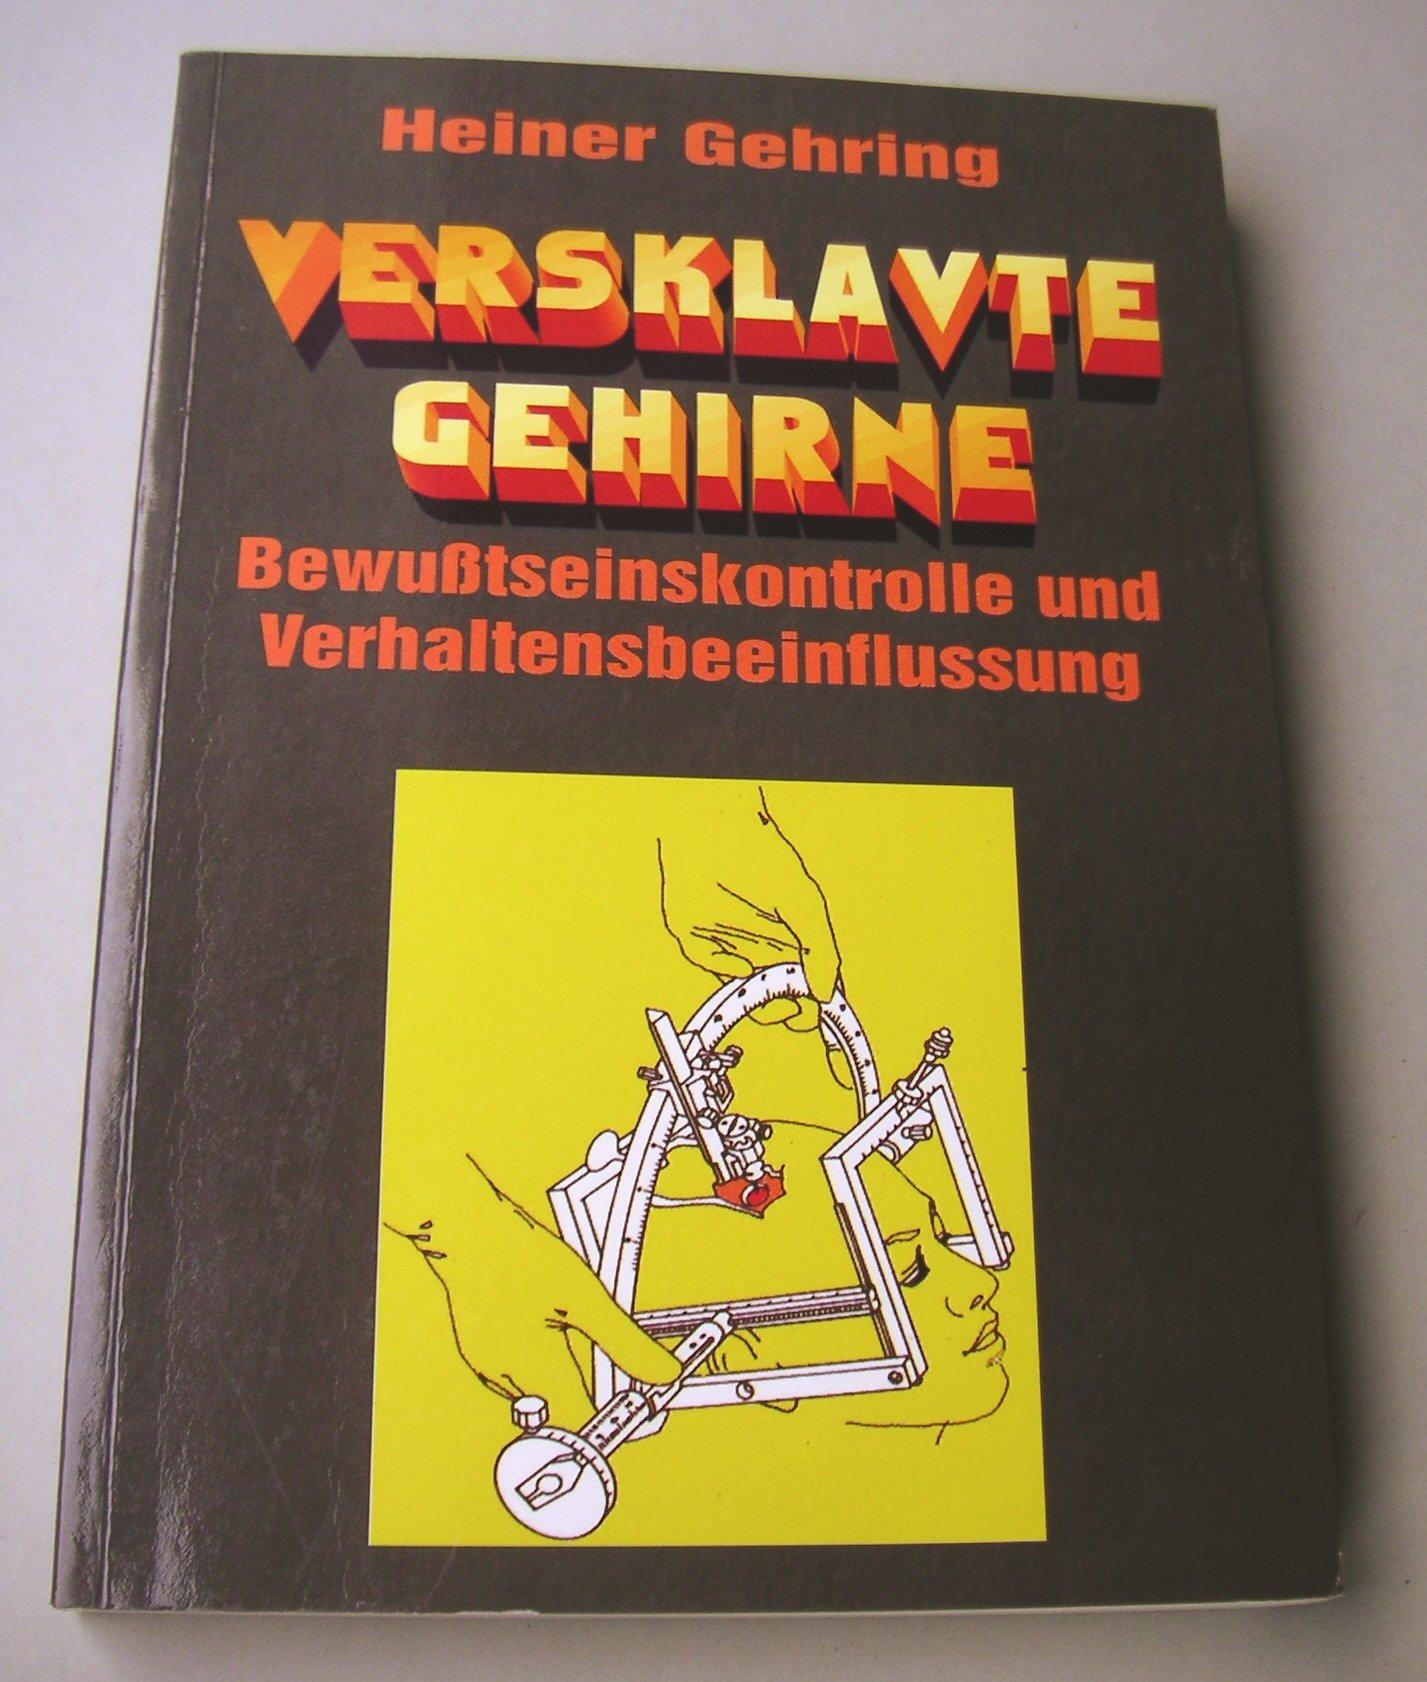 HEINER GEHRING VERSKLAVTE GEHIRNE PDF